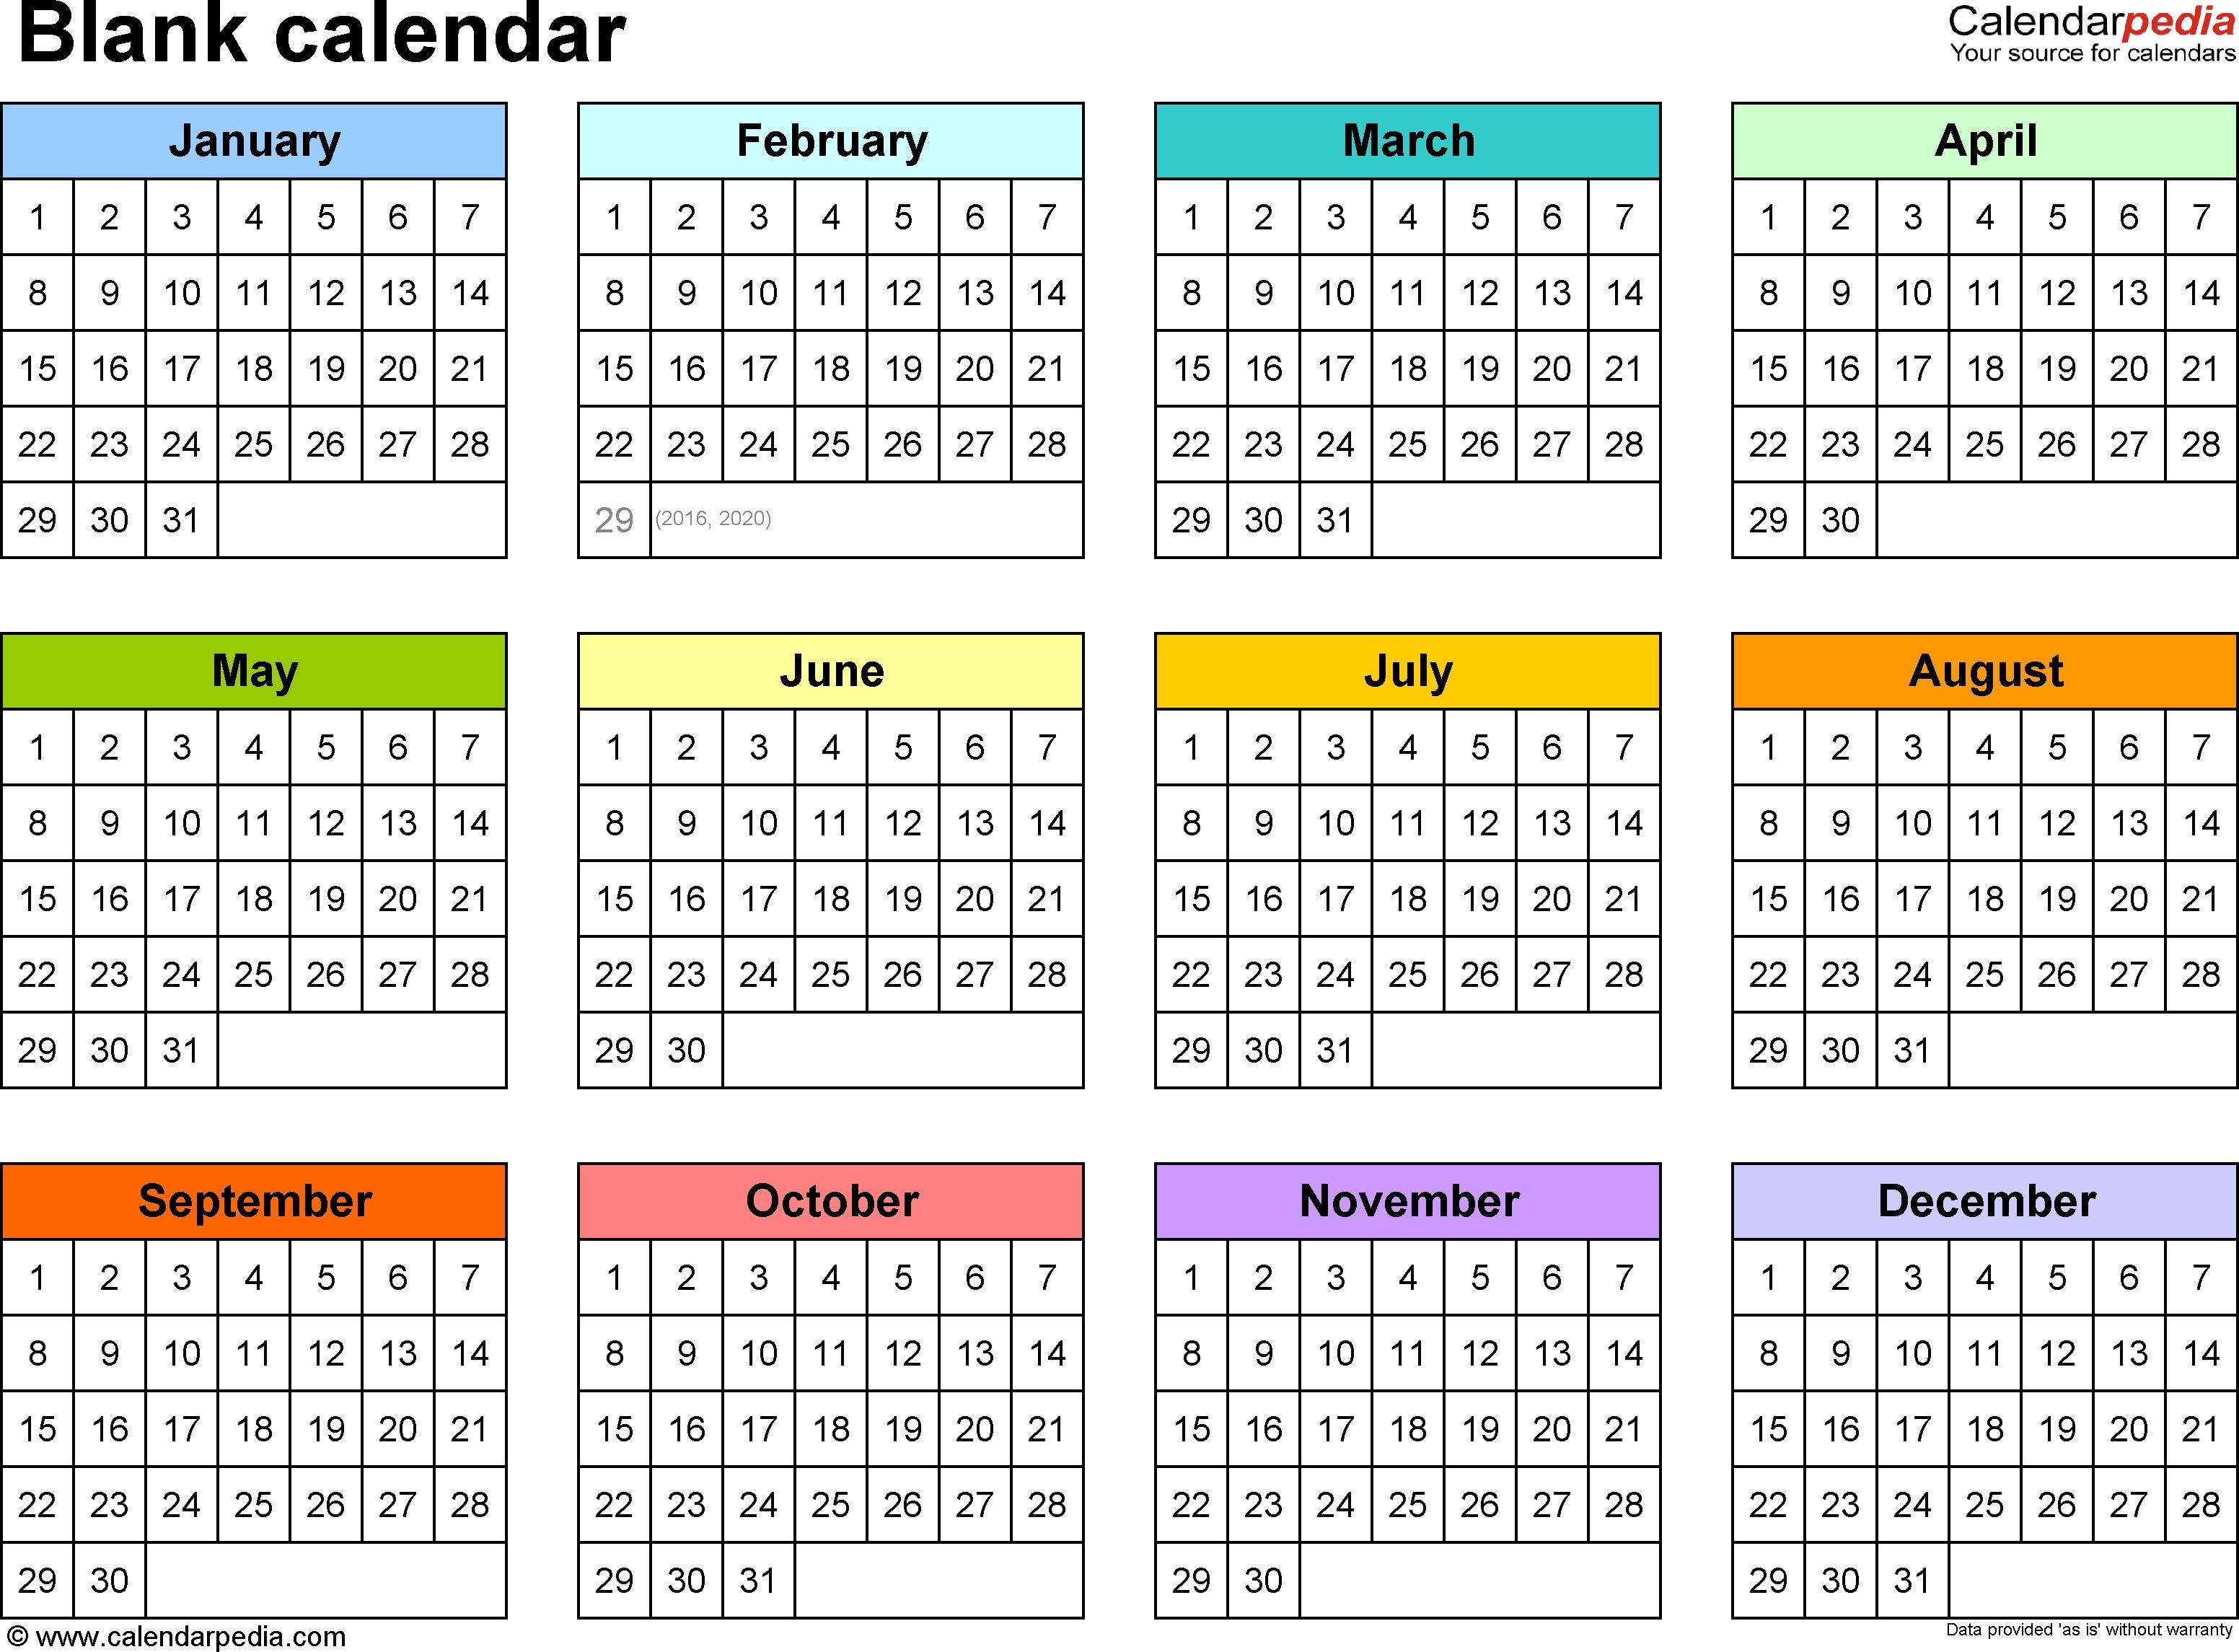 Blank Calendar - 9 Free Printable Microsoft Word Templates 5 Month Calendar Template